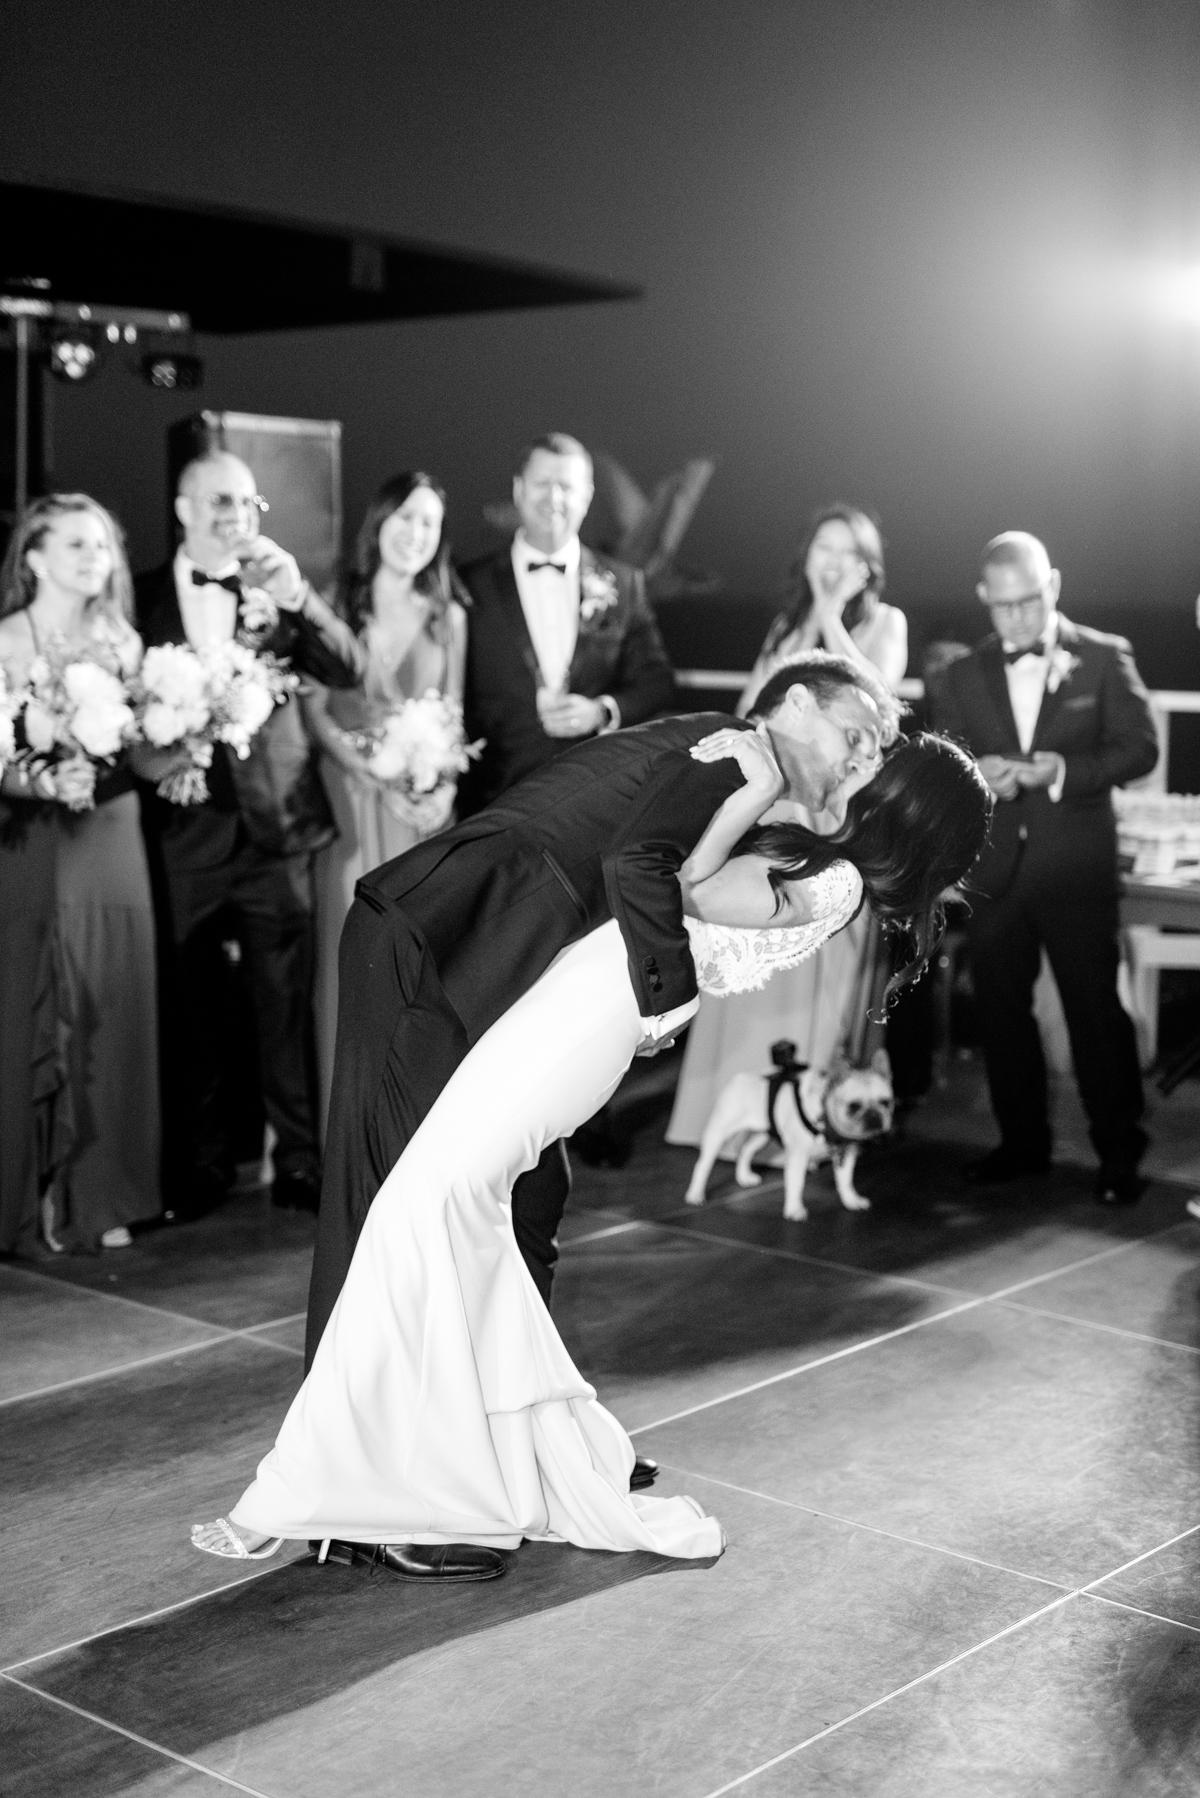 bettina gino wedding first dance dip and kiss